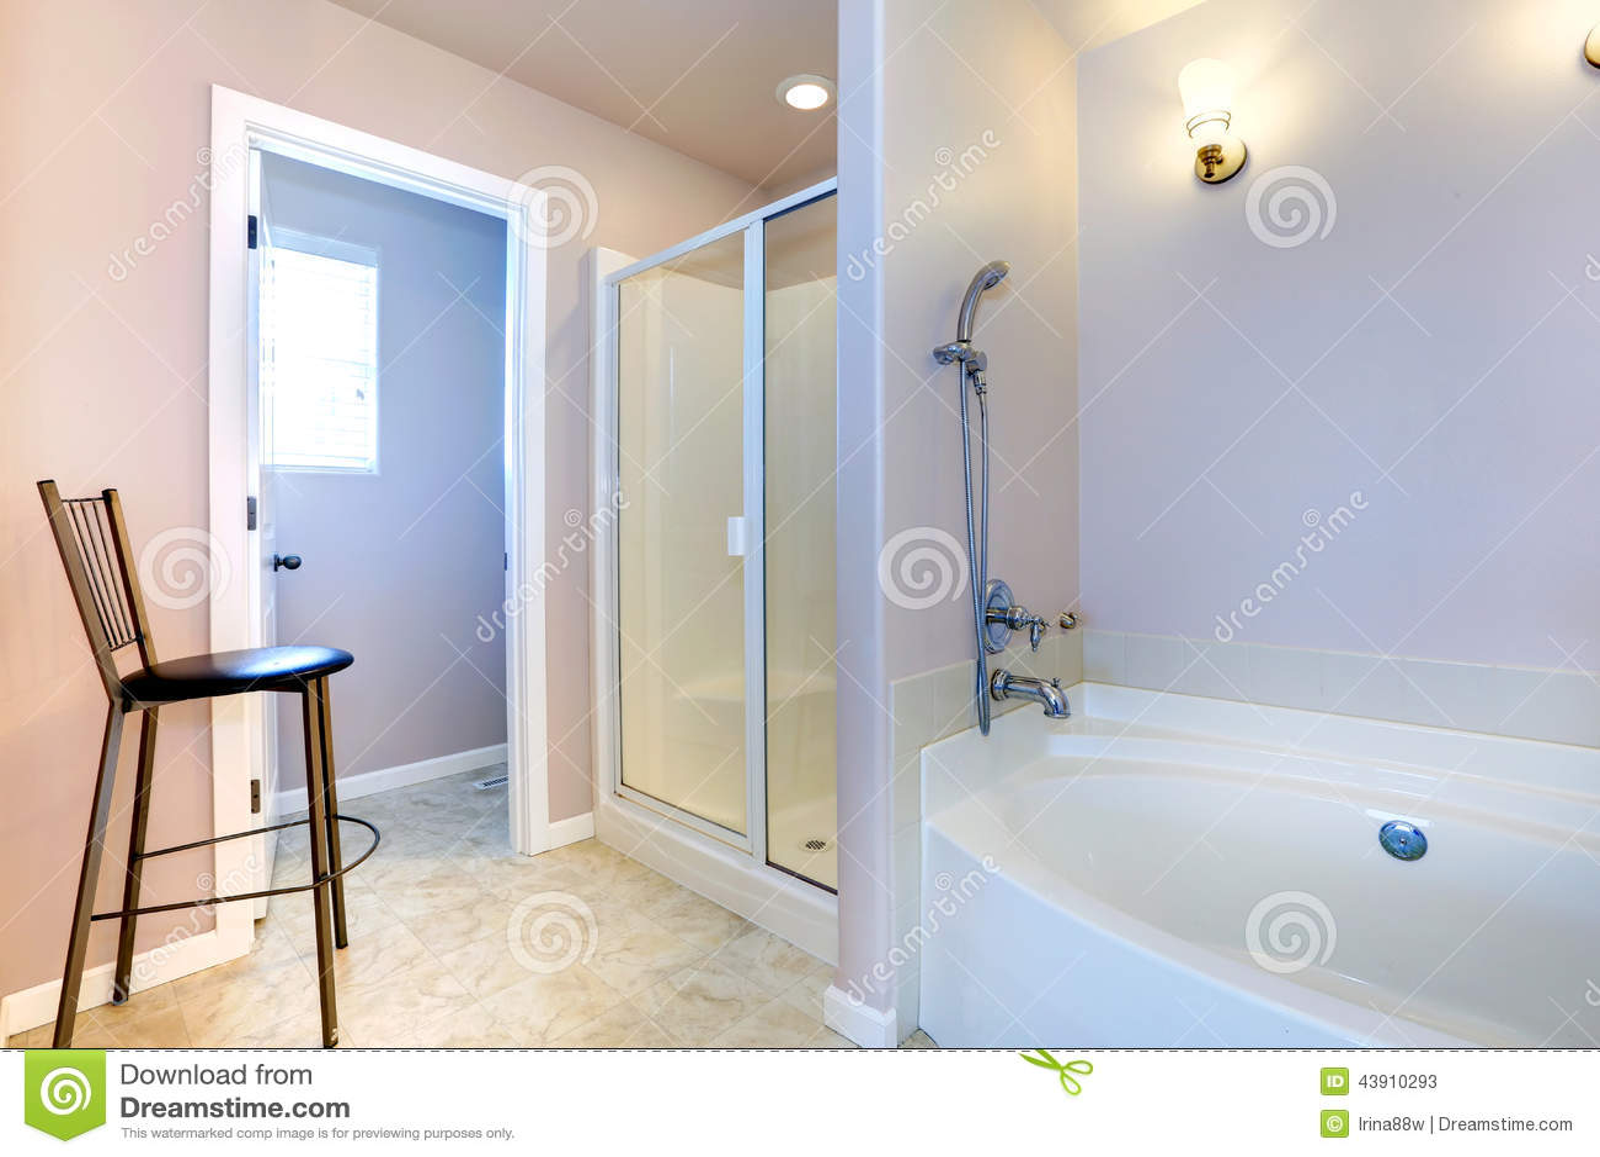 Refreshing light lavender bathroom with white bath tub and - Lavender and white bathroom ...